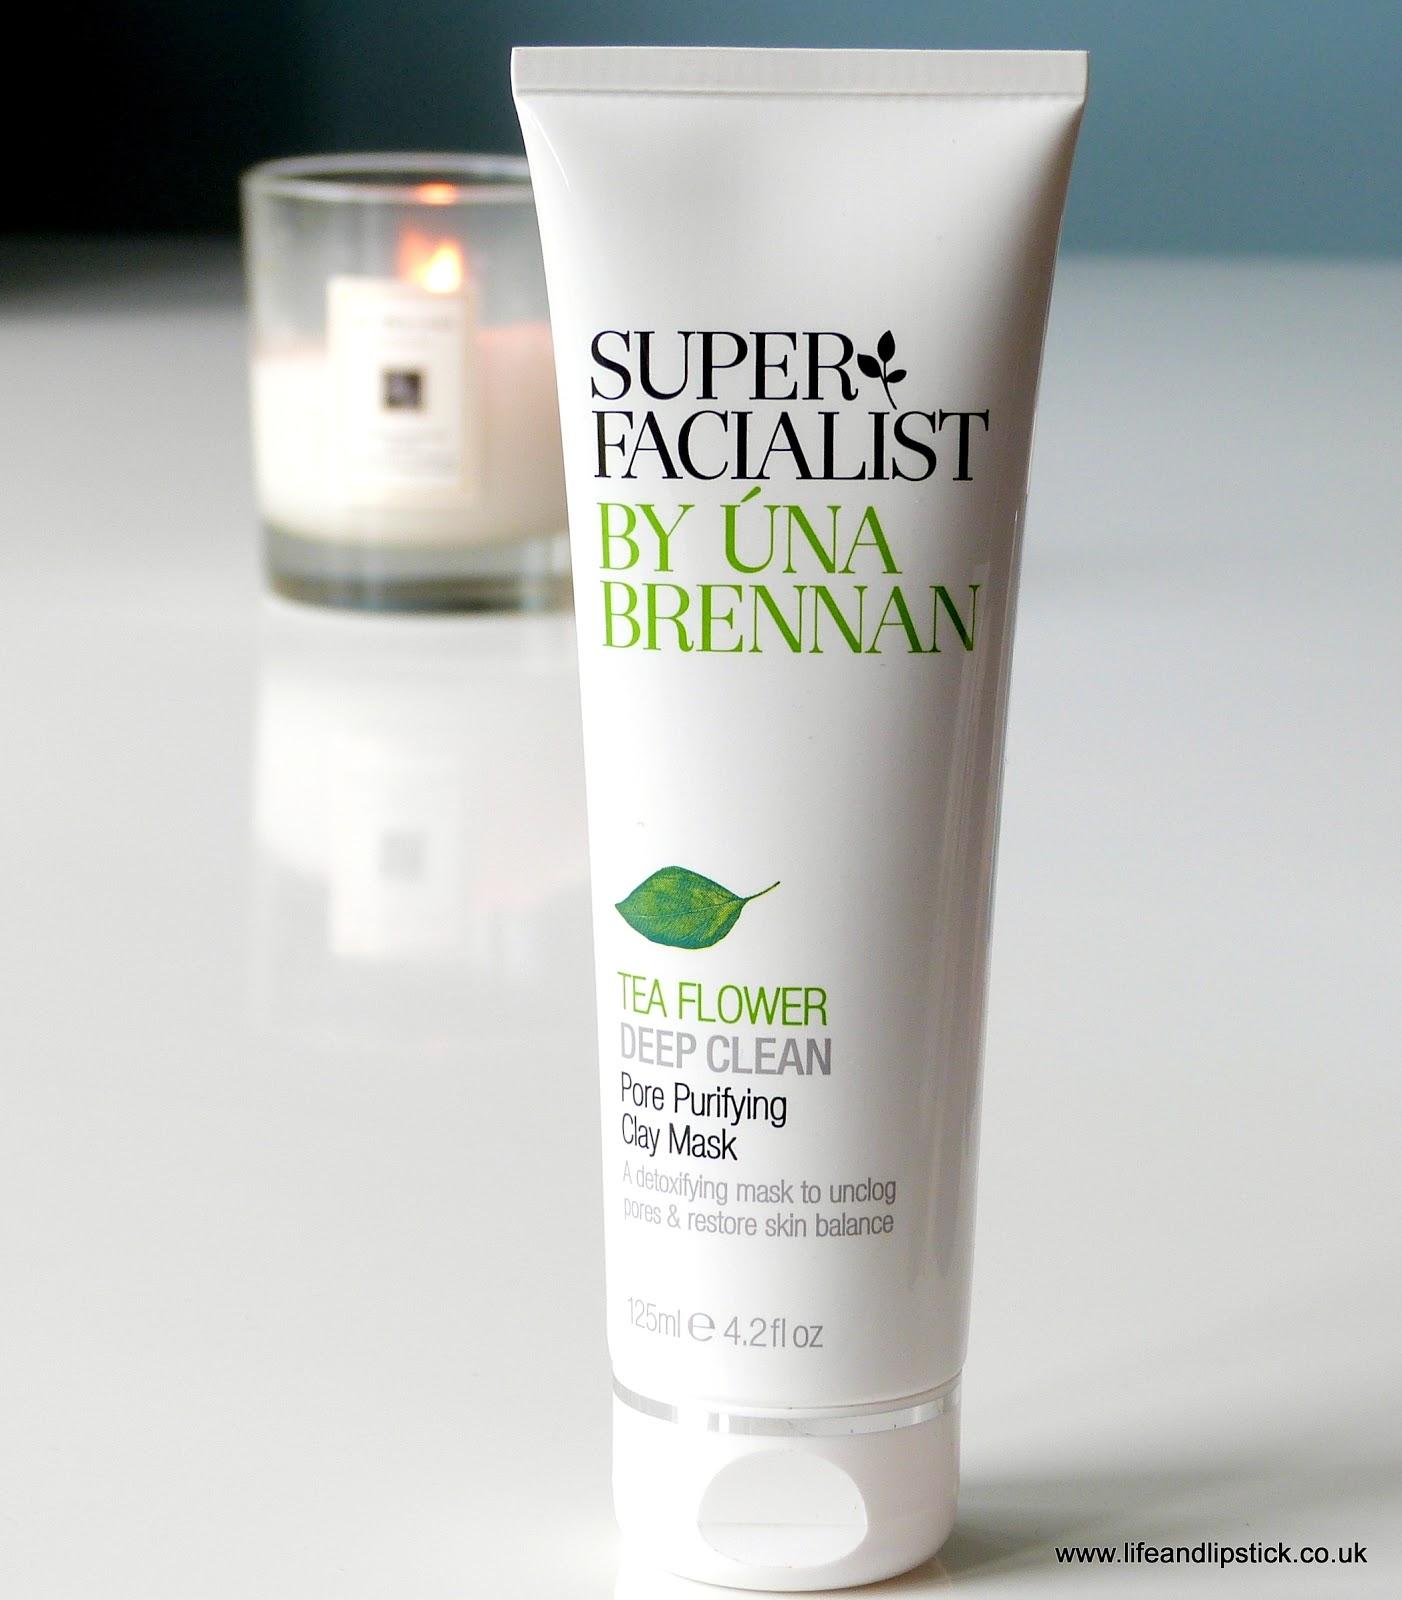 Super Facialist by Una Brennan Tea Flower Deep Clean Pore Purifying Clay Mask